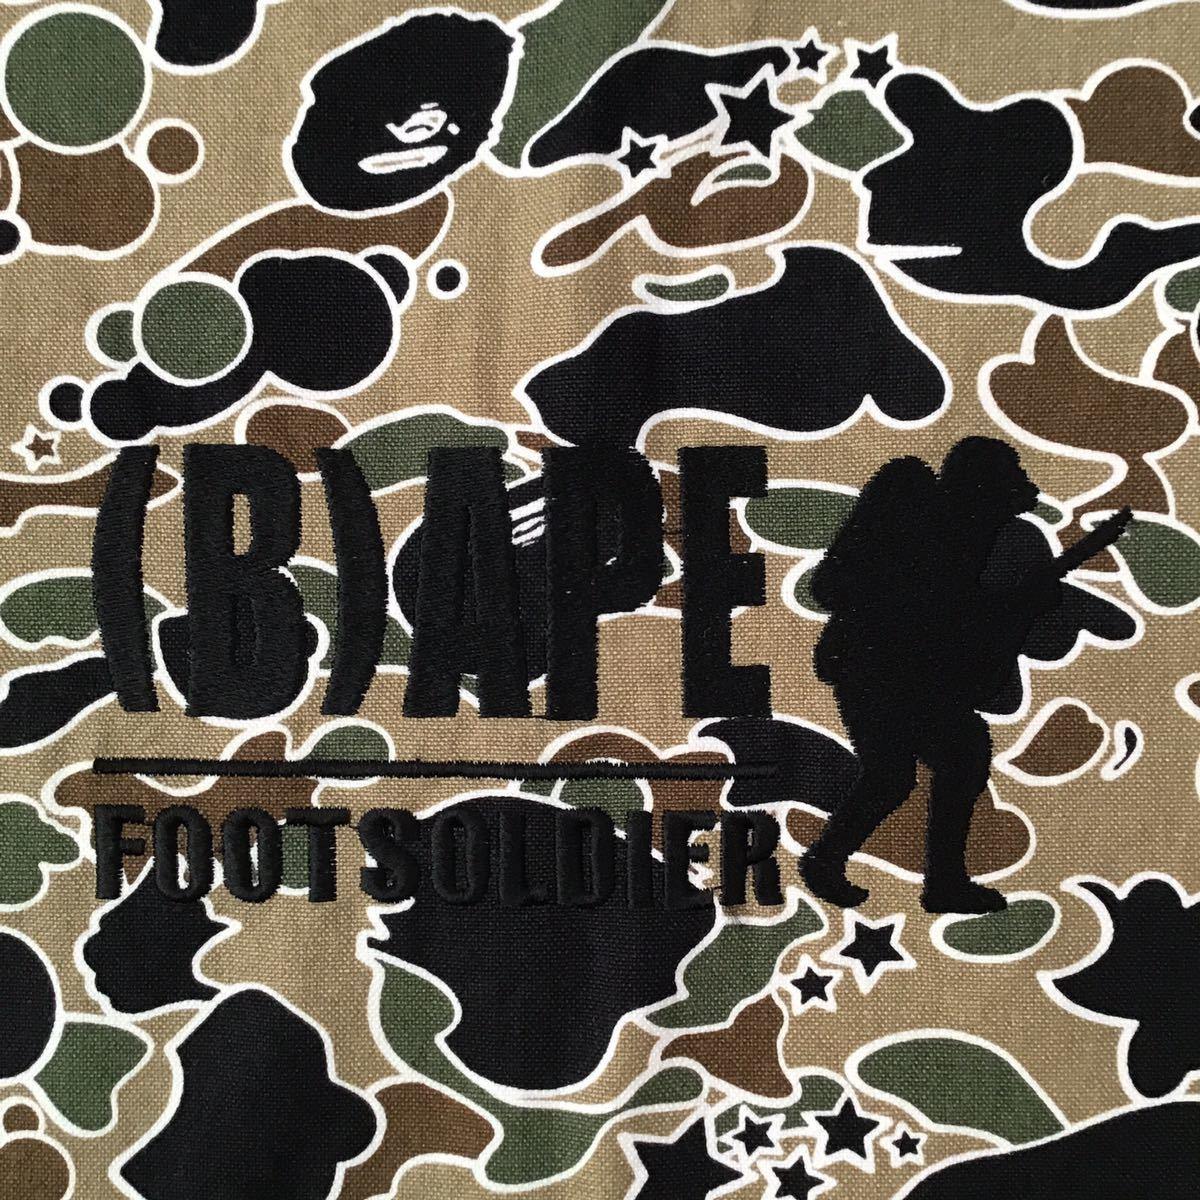 sta camo 巾着袋 a bathing ape bape foot soldier バッグ bag エイプ ベイプ フットソルジャー psyche camo 迷彩 nigo 2532